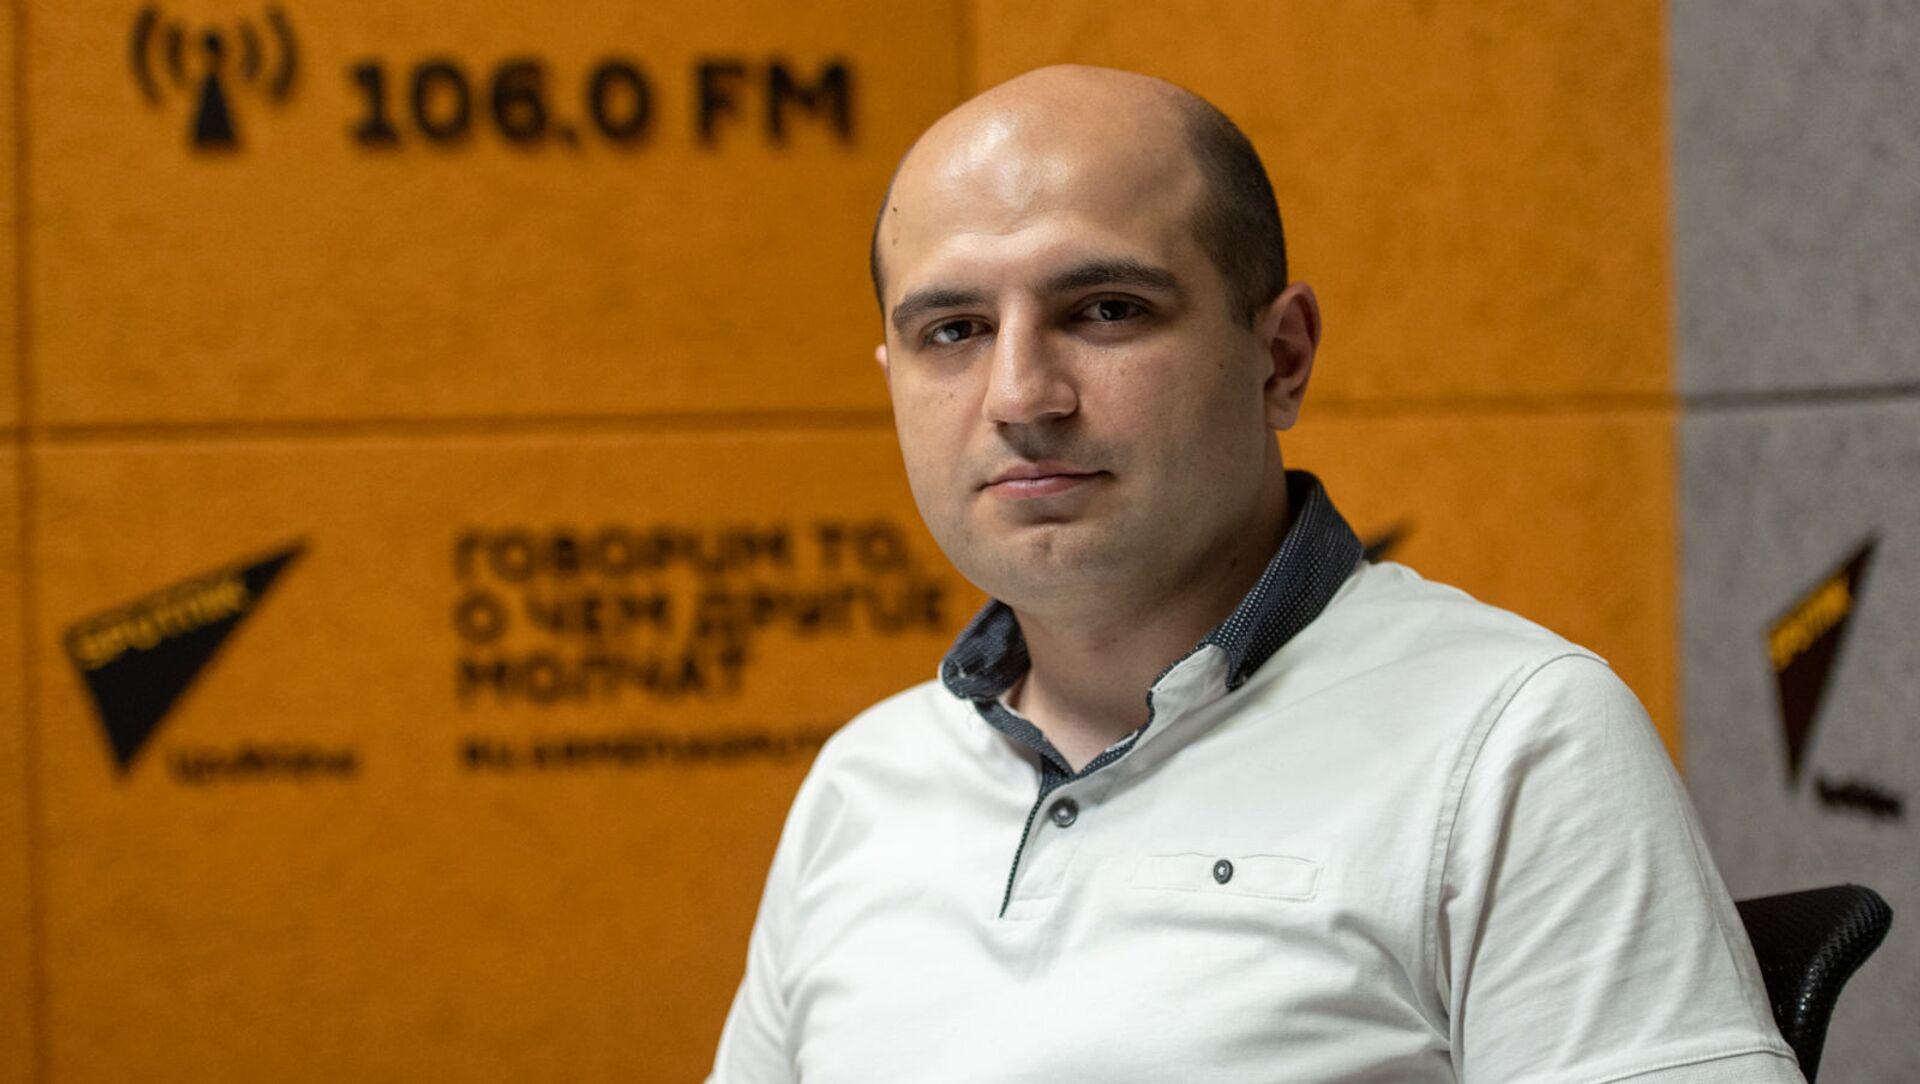 Политолог Норайр Дунамалян в гостях радио Sputnik - Sputnik Արմենիա, 1920, 12.08.2021